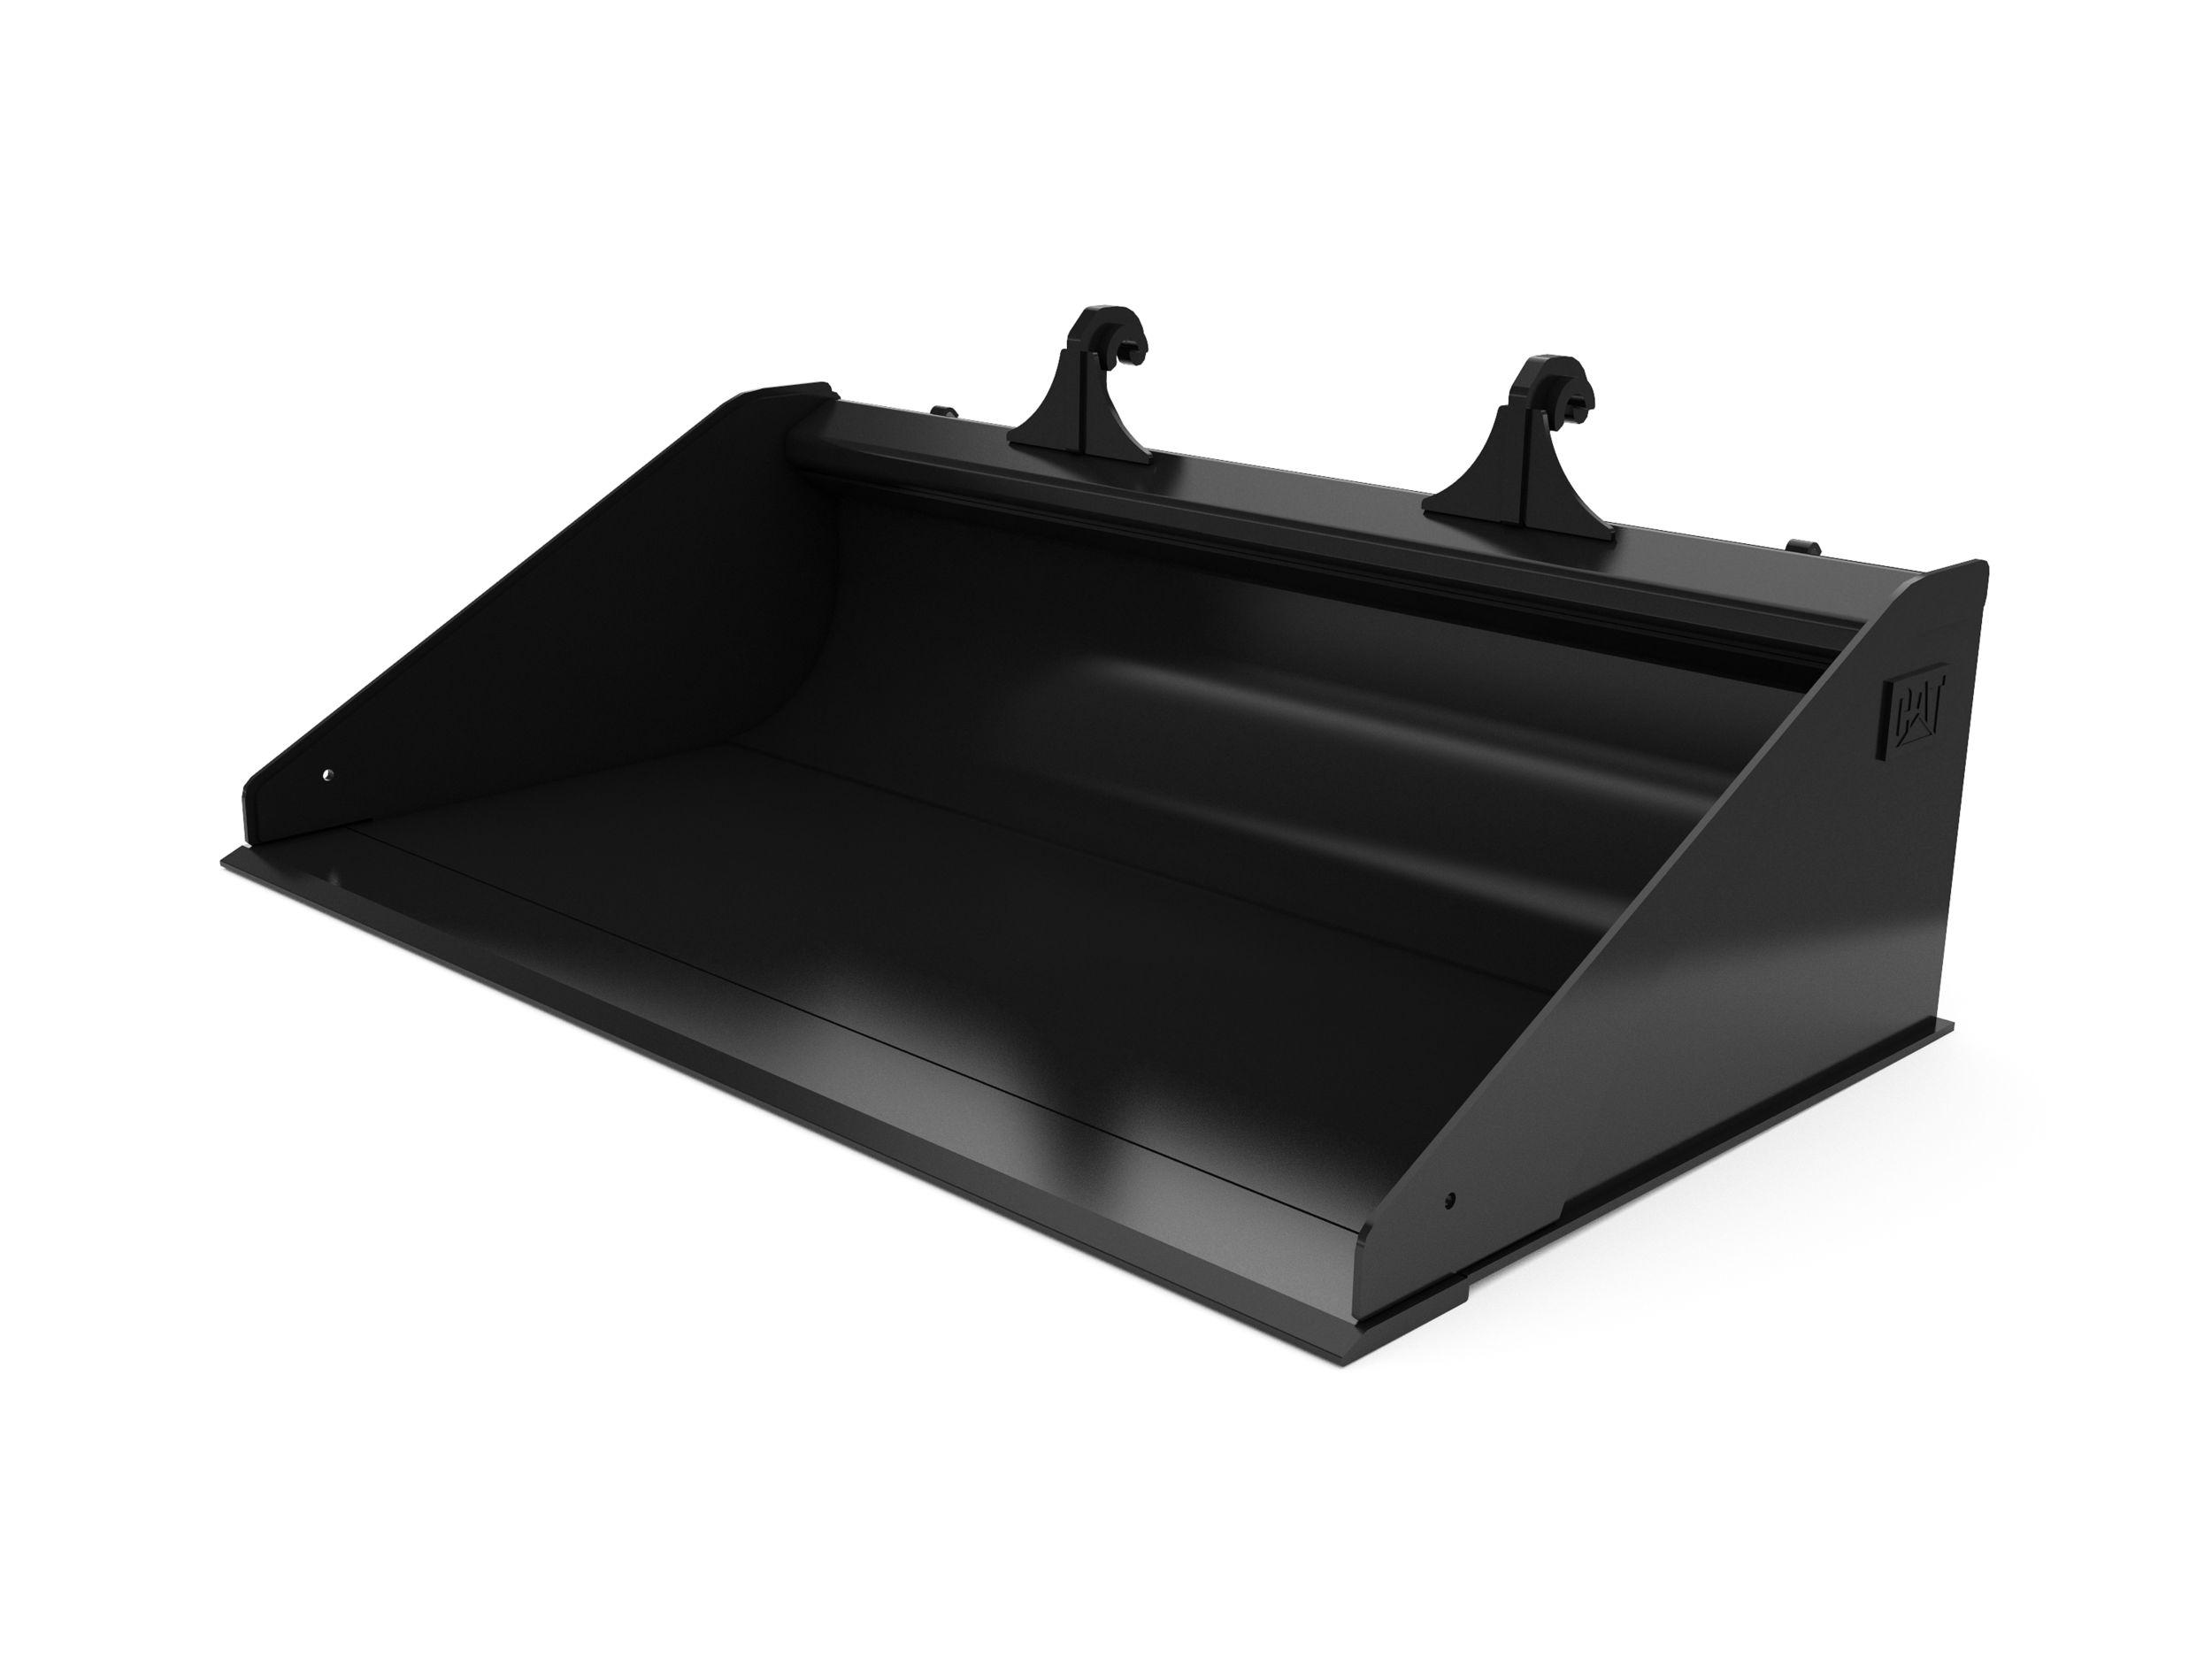 1.8 m3 (2.4 yd3) ISO Coupler Grading Bucket